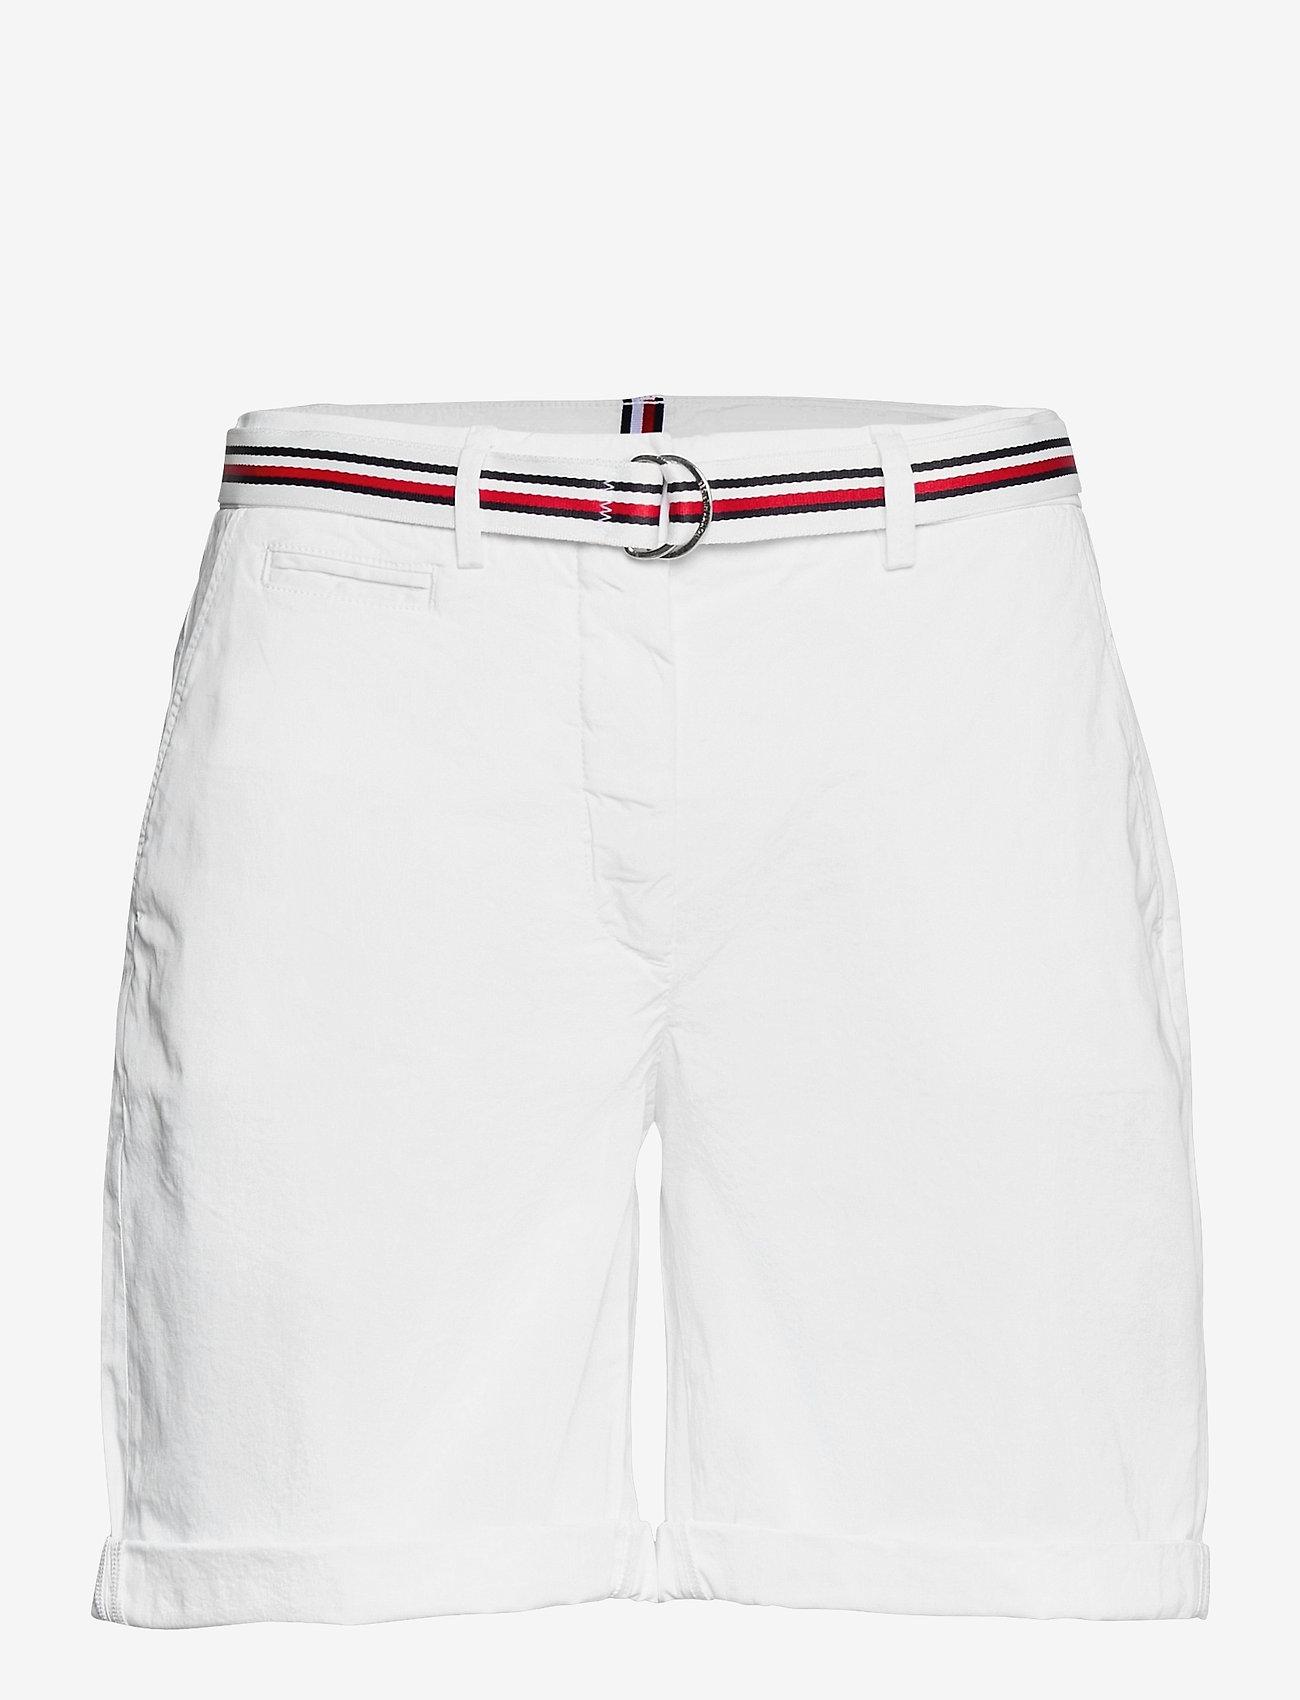 Tommy Hilfiger - COTTON TENCEL CHINO RW SHORT - chino shorts - white - 0